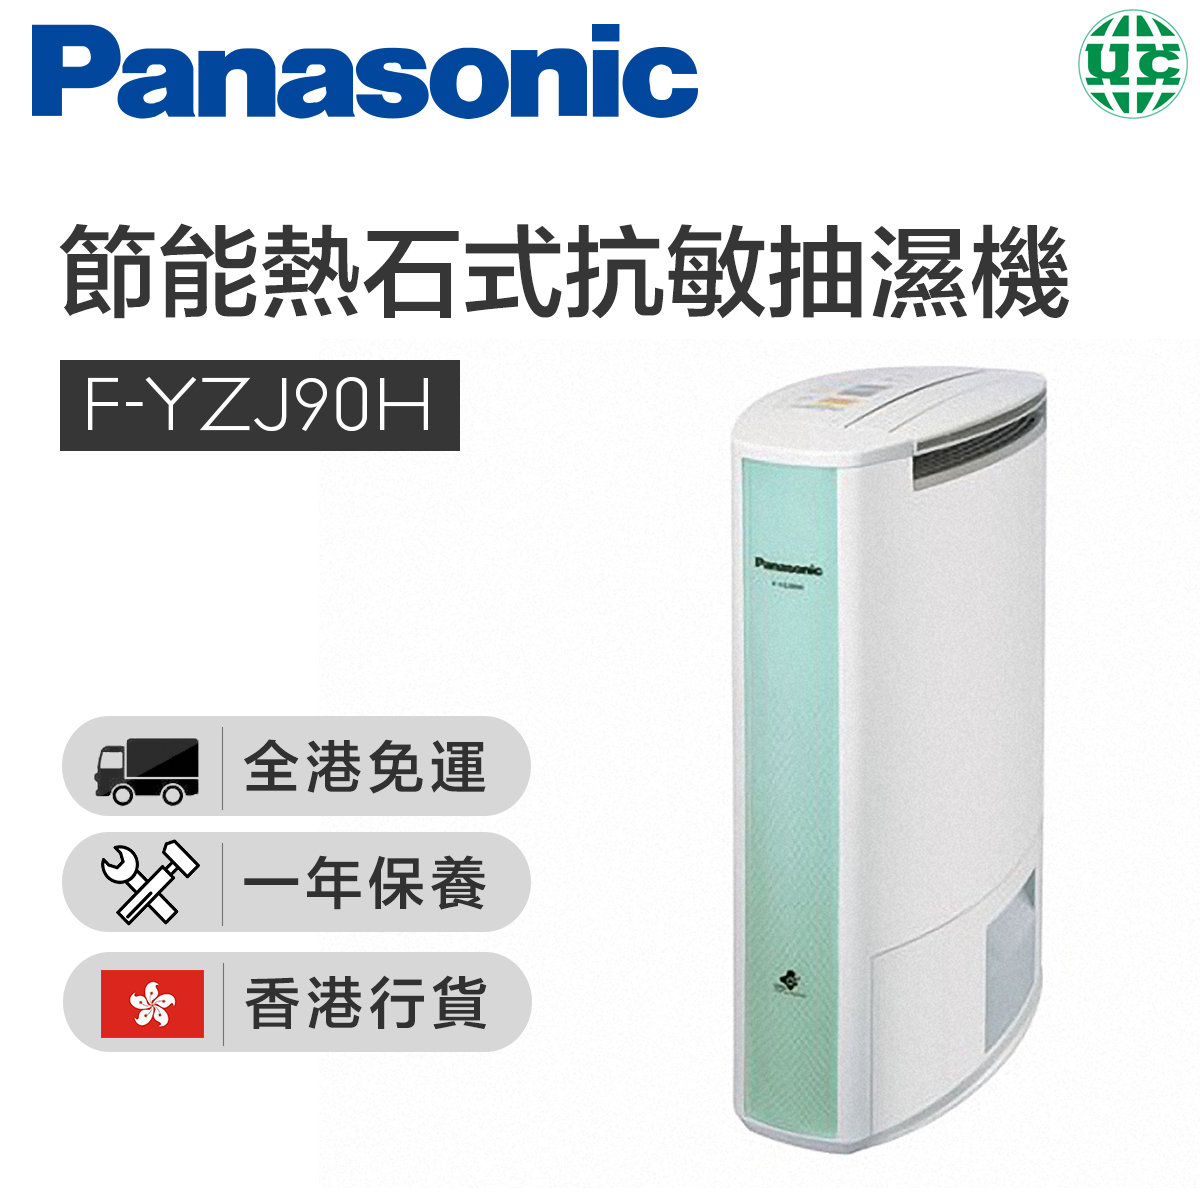 F-YZJ90H ECONAVI 智慧節能「熱石式」抗敏抽濕機(9公升)(香港行貨)